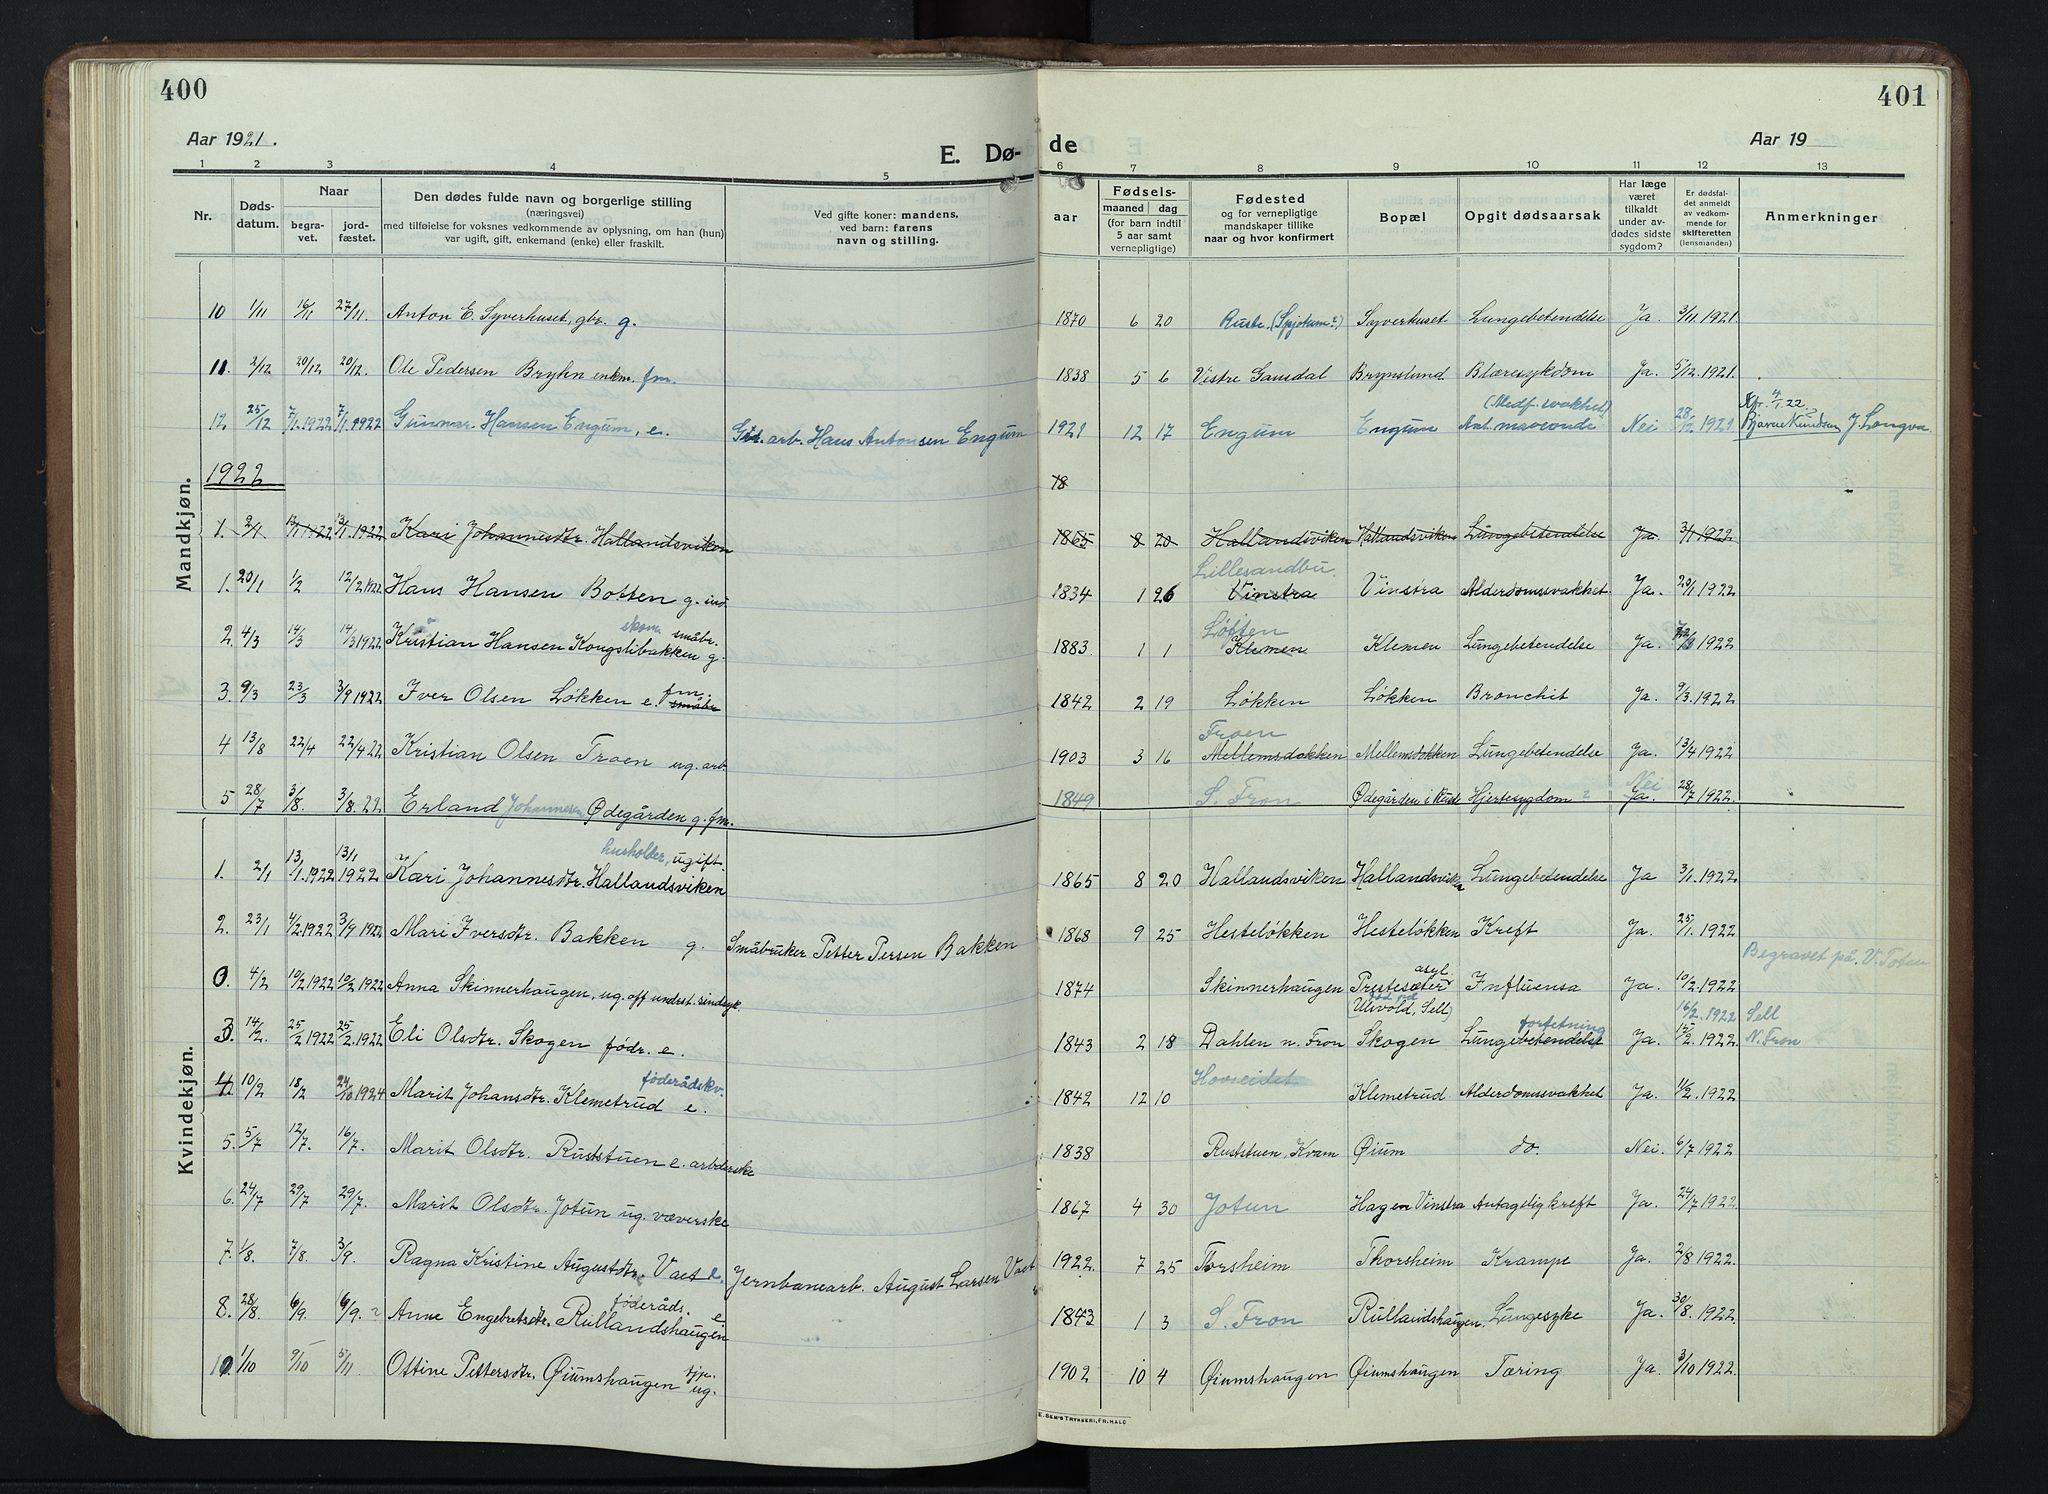 SAH, Nord-Fron prestekontor, Klokkerbok nr. 7, 1915-1946, s. 400-401